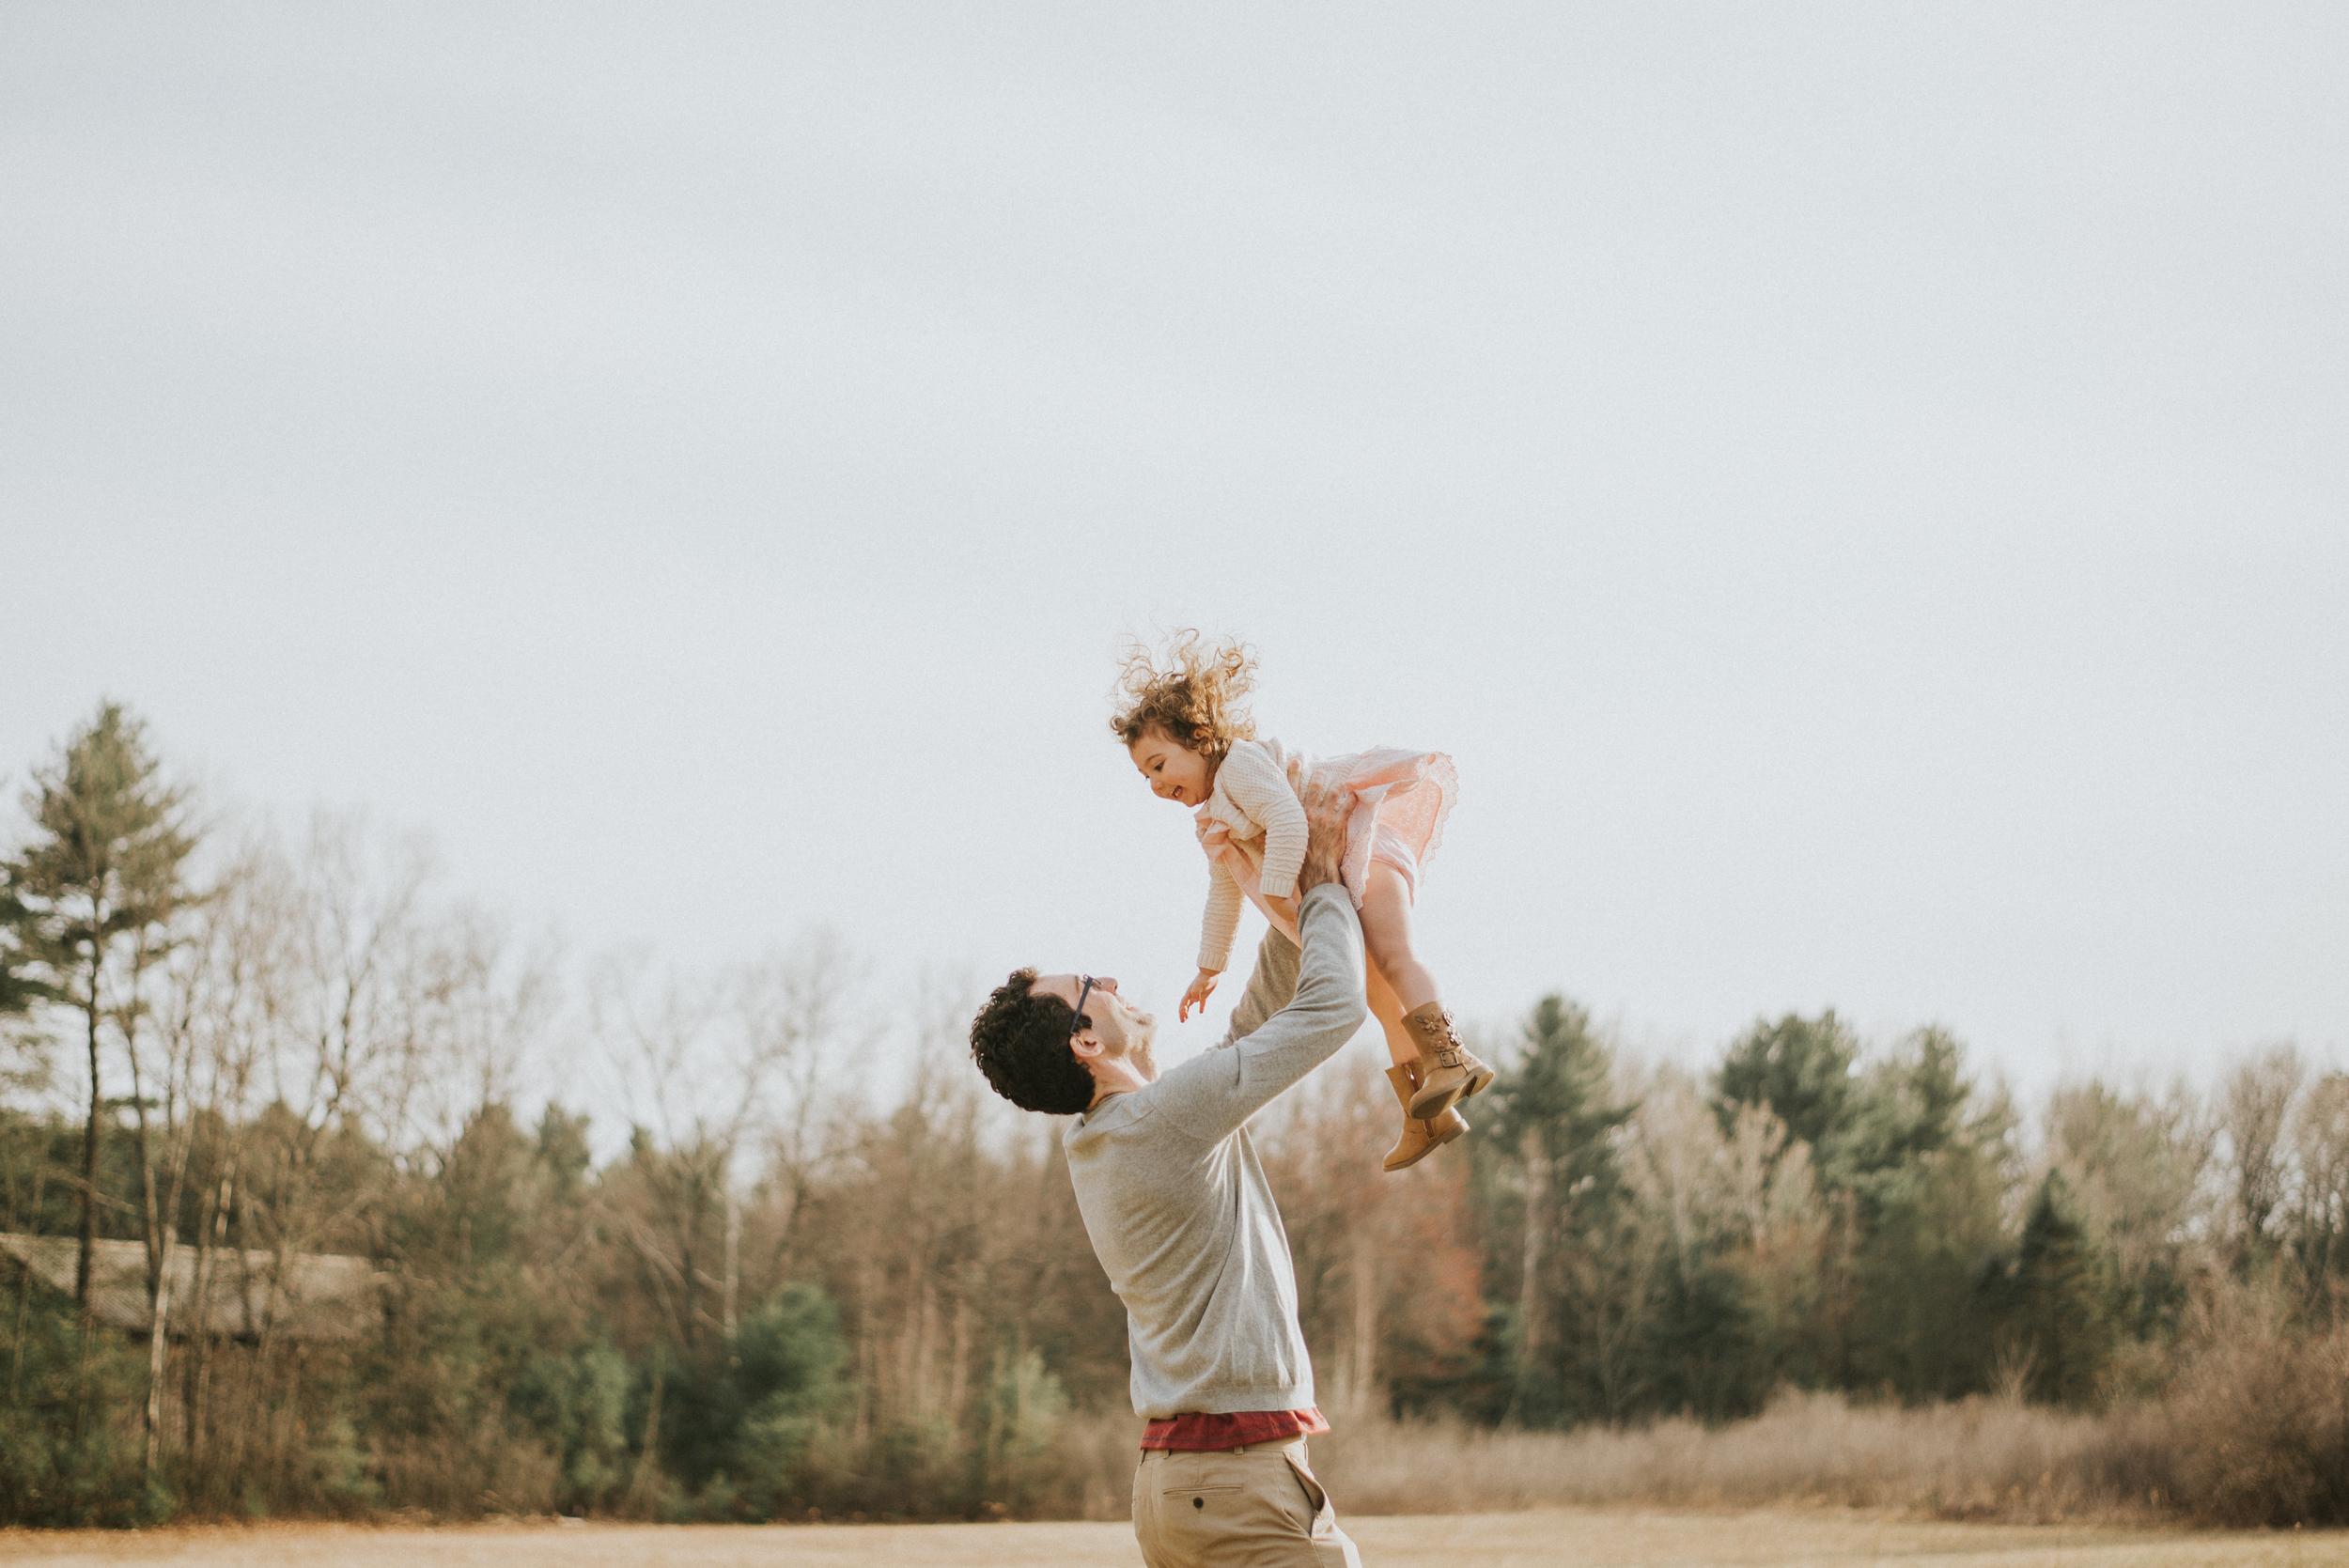 Megan Fuss Photography Maternity Family Session 00019.jpg